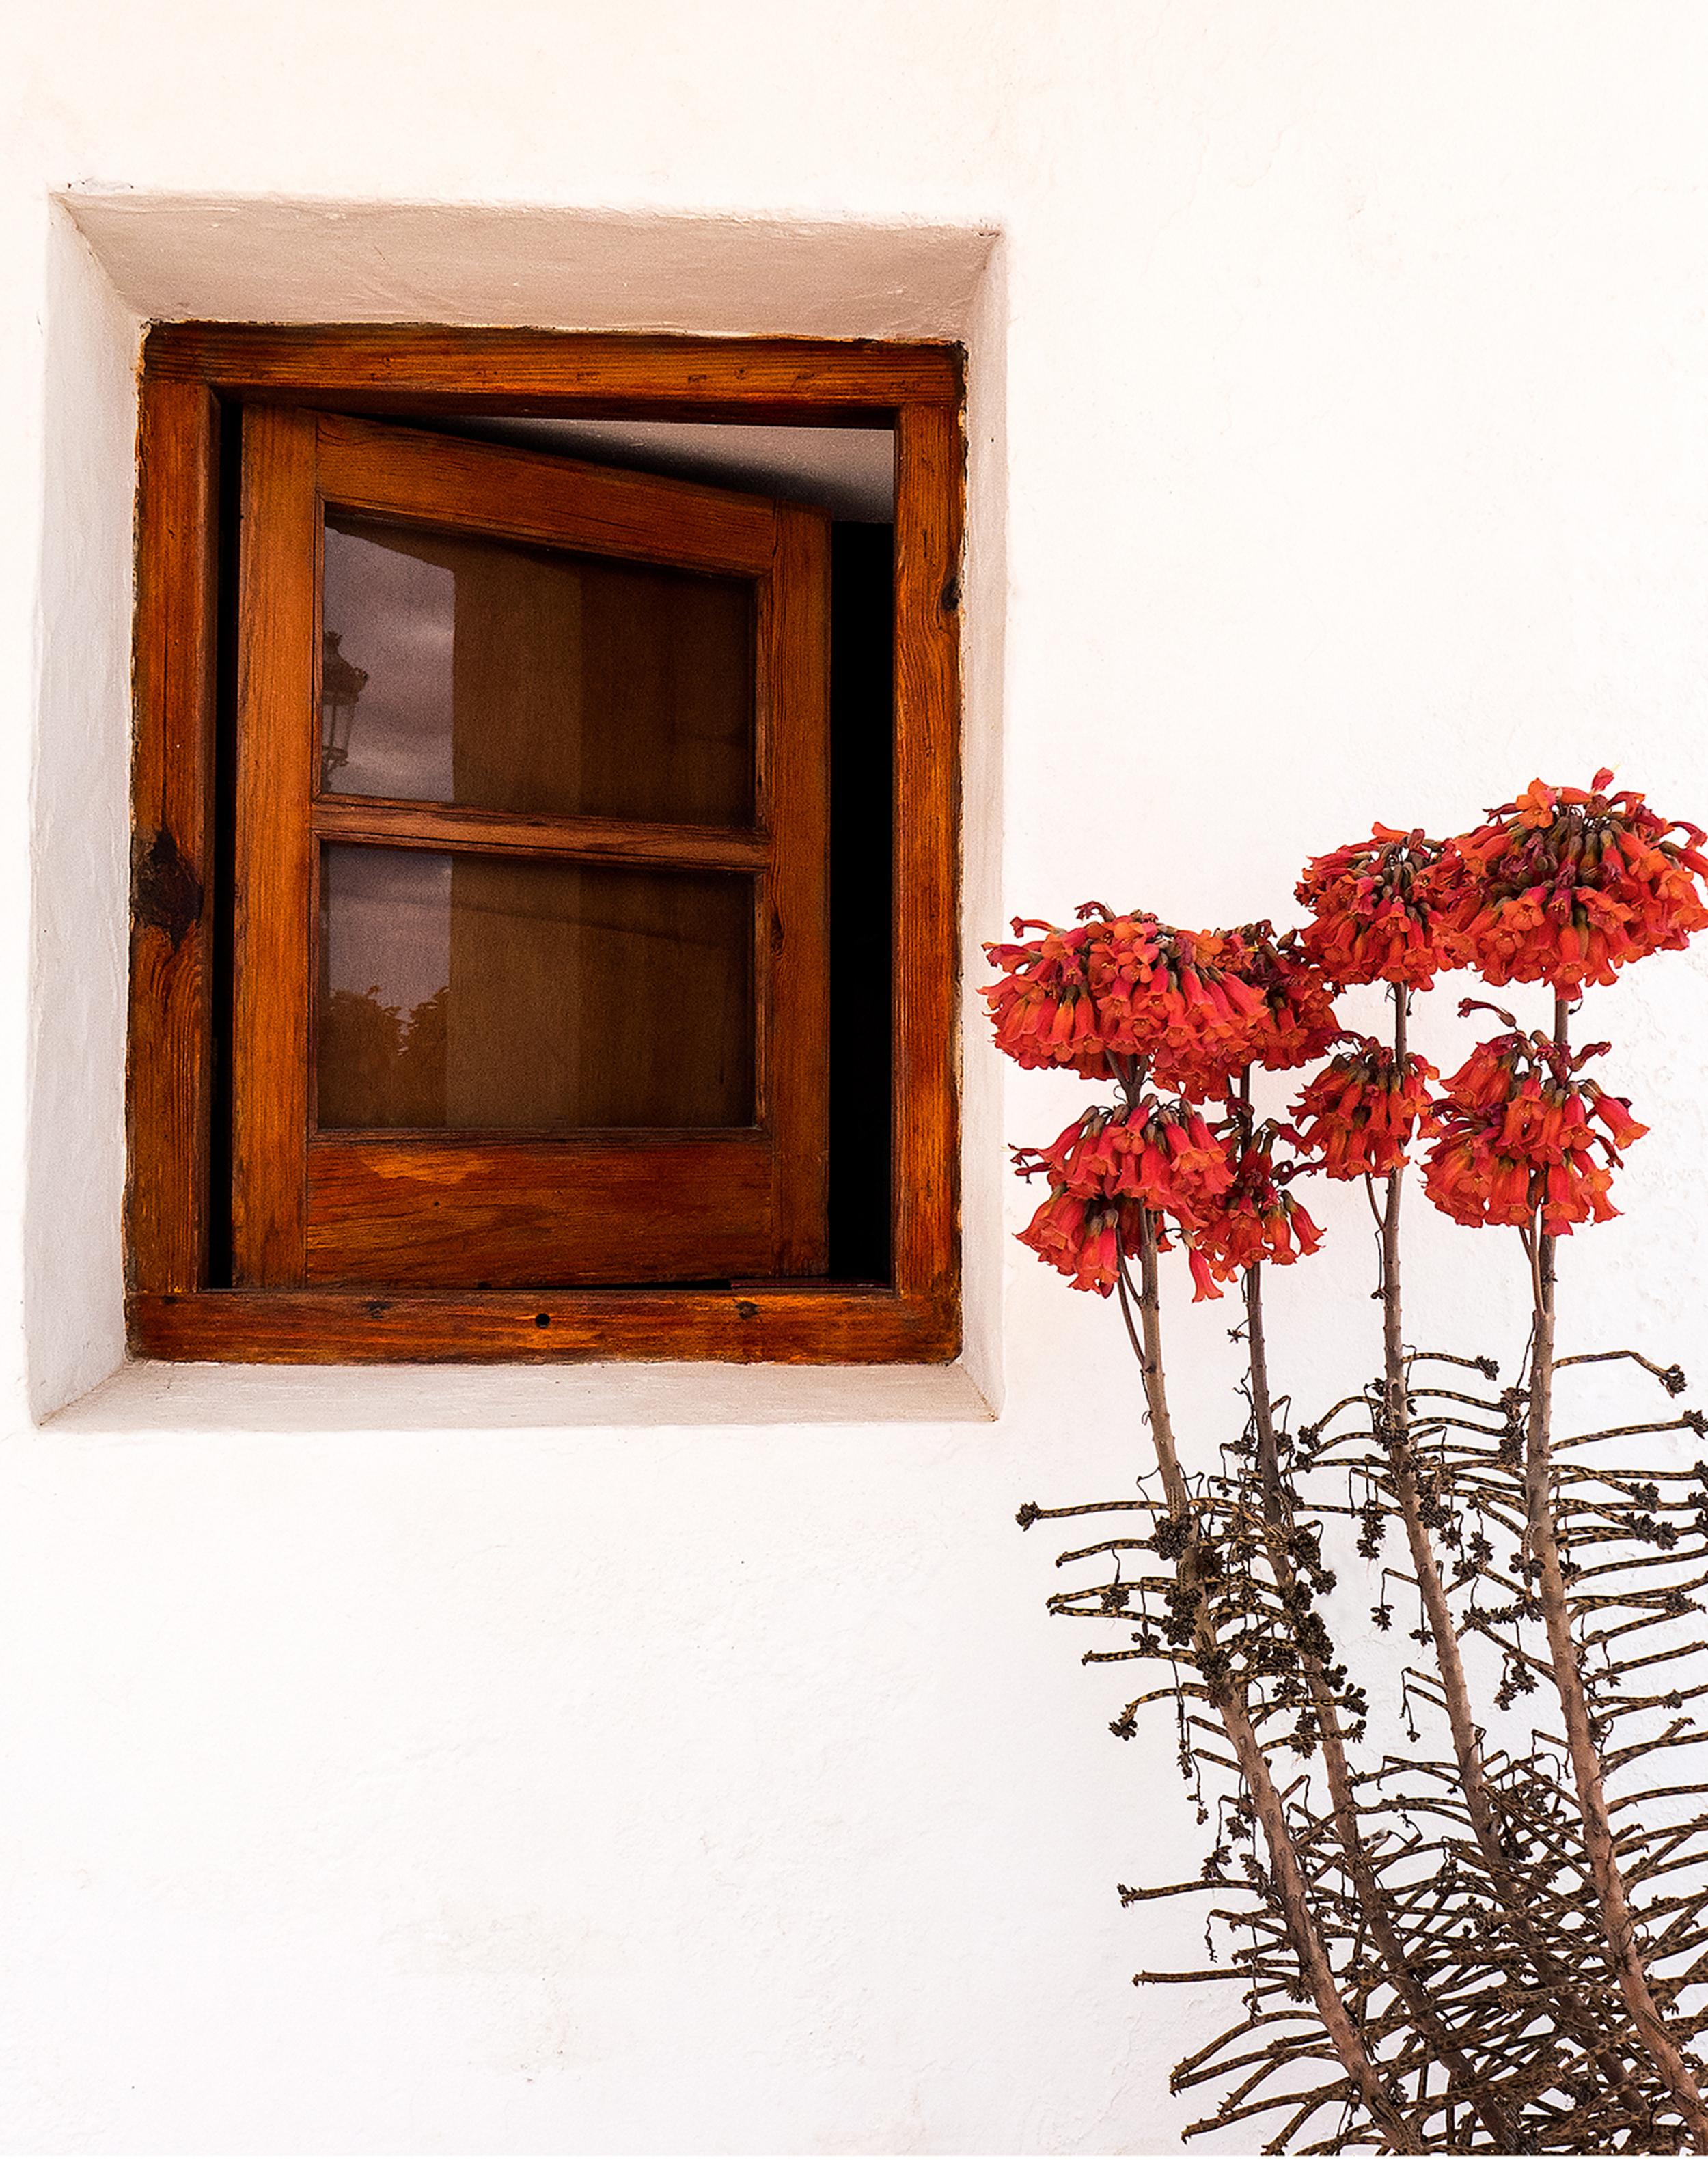 window_8x10 epsm (2).jpg